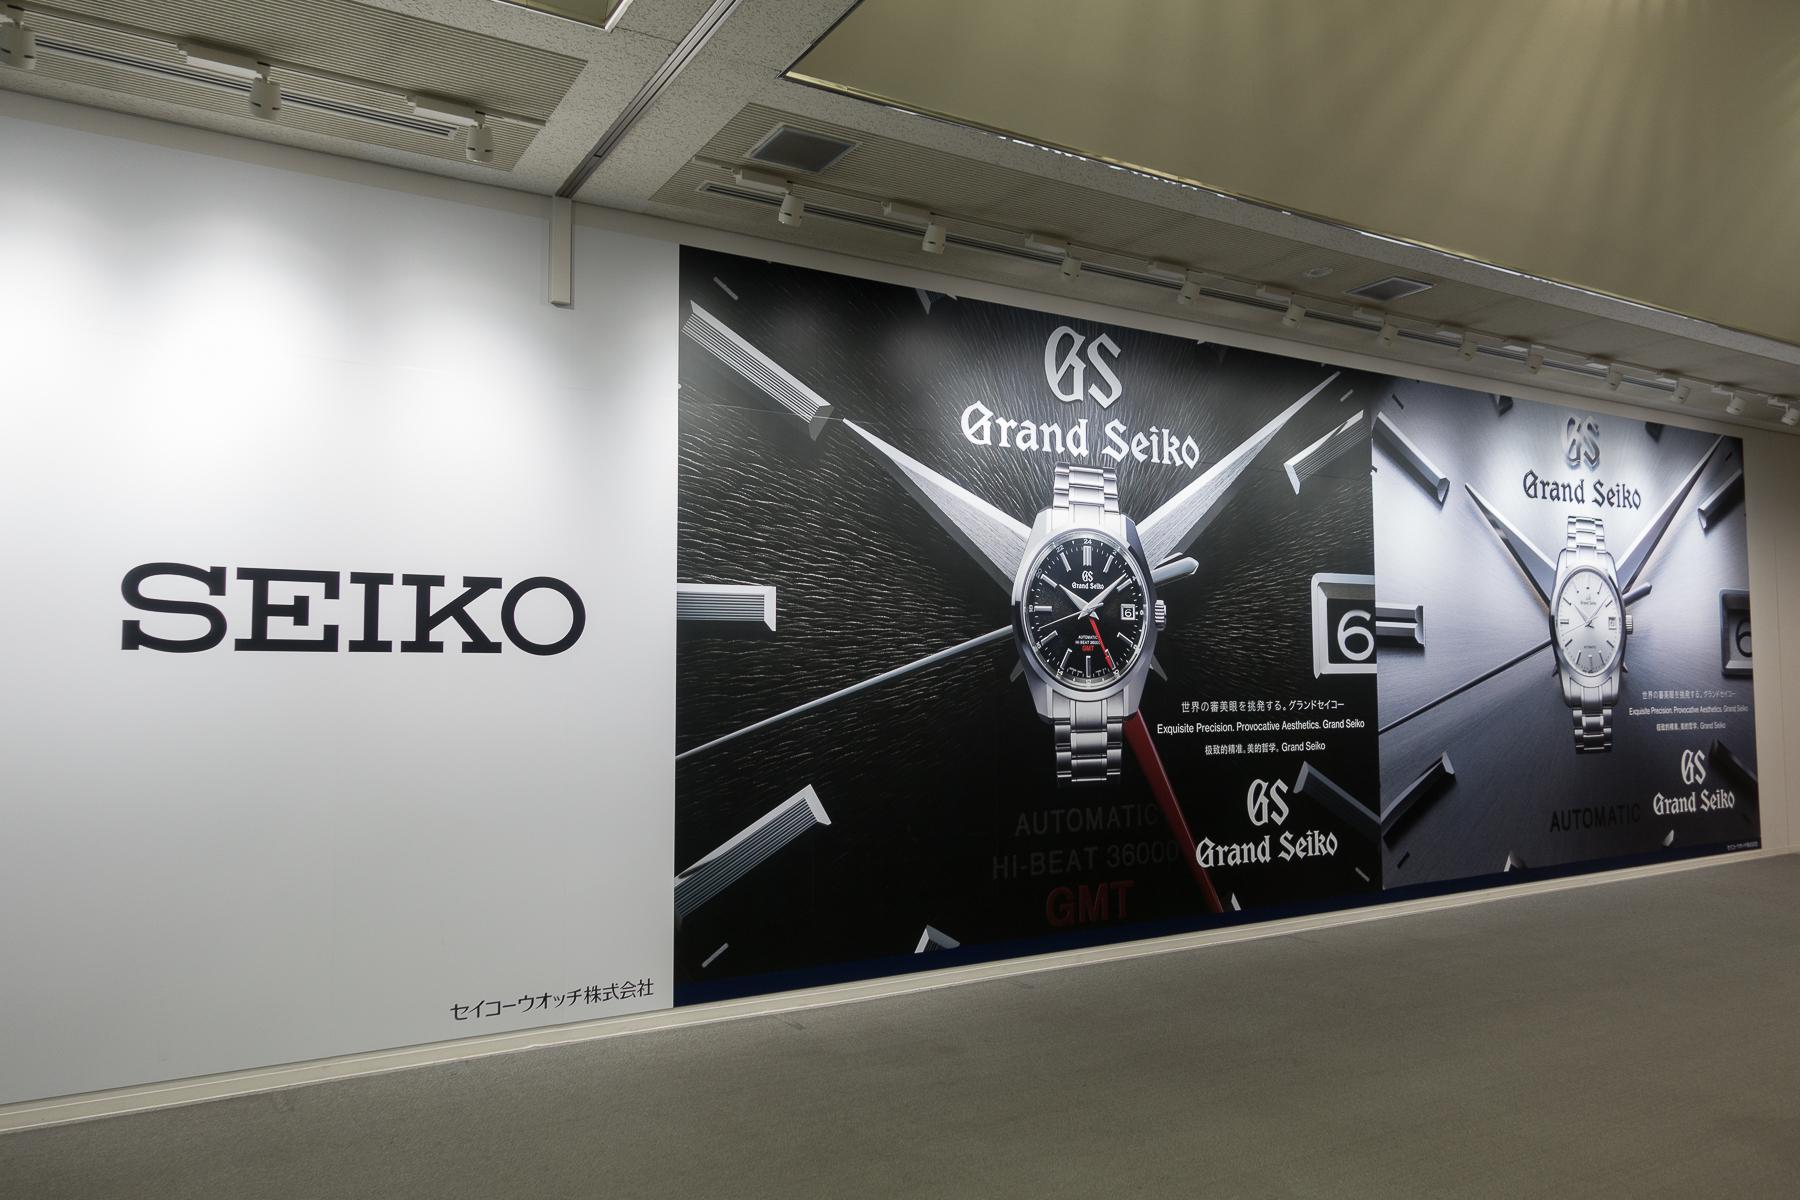 Narita GS Airport Signage